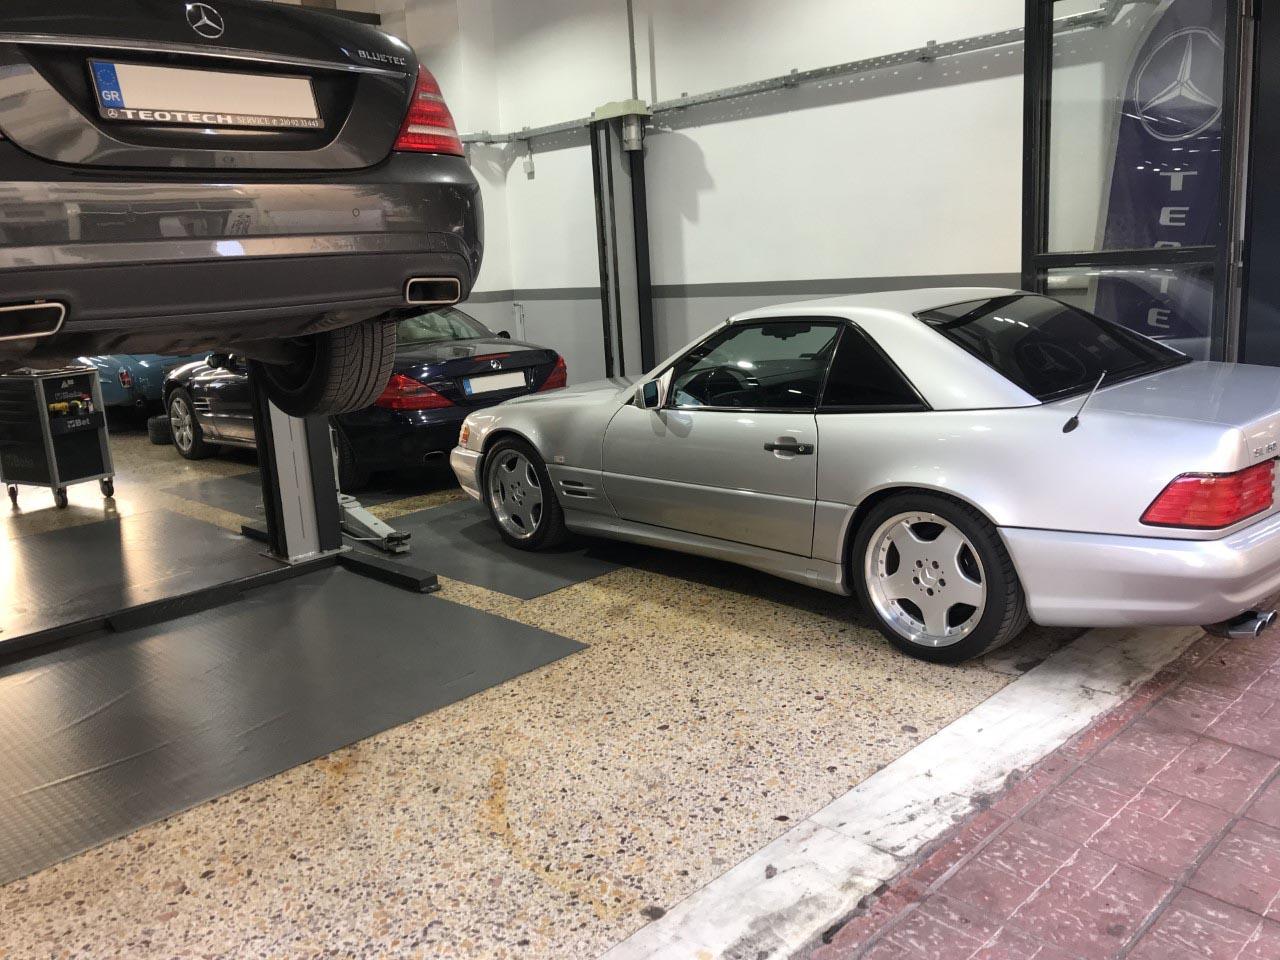 Teotech - Εξειδικευμένο Συνεργείο Mercedes-Benz